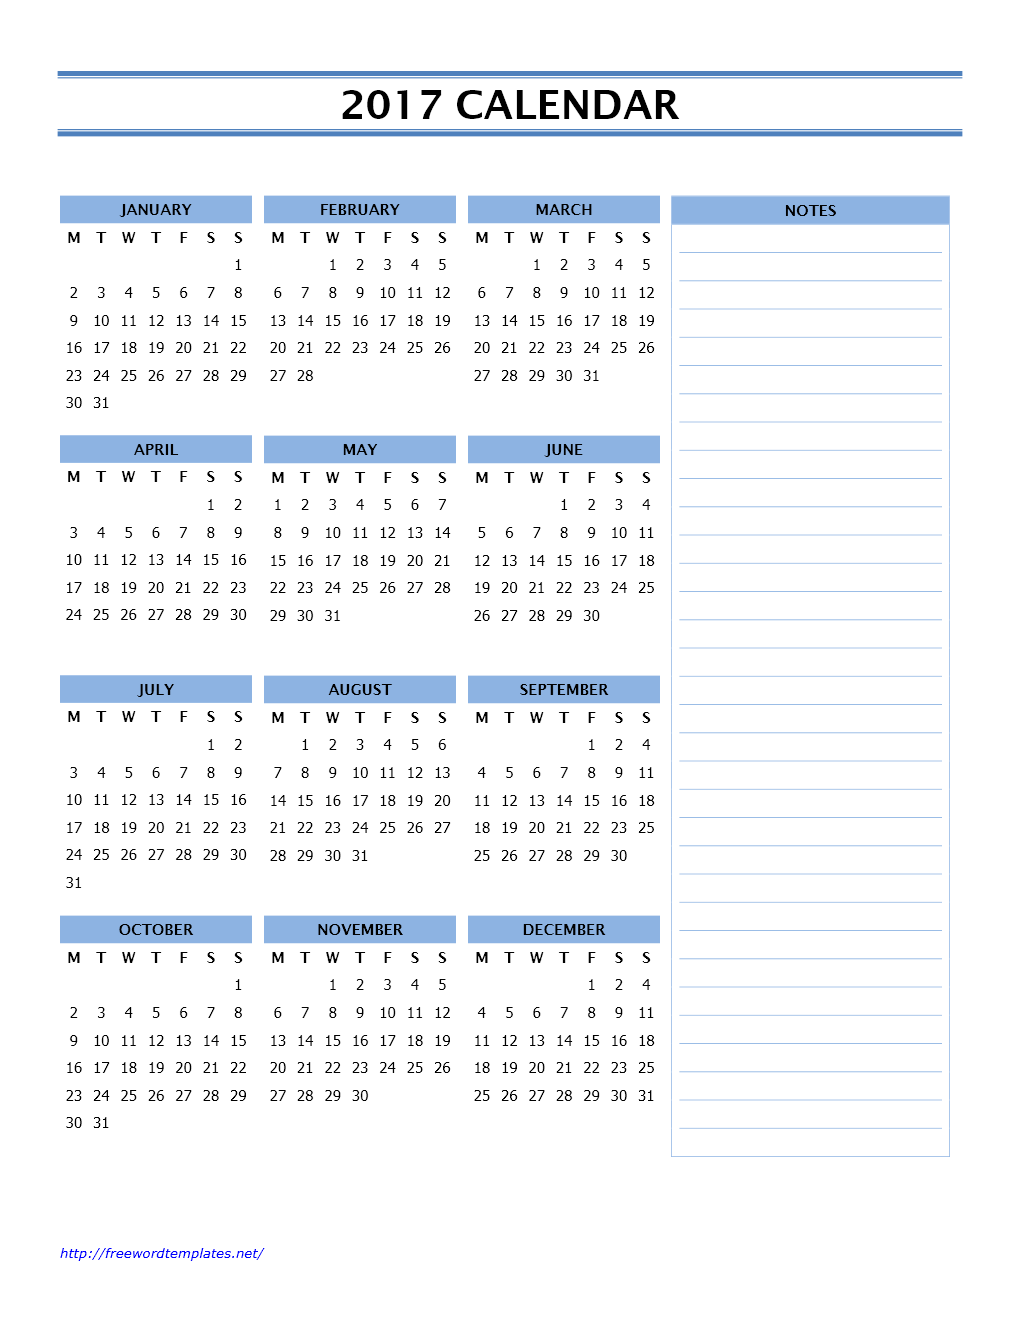 microsoft word 2017 calendar templates